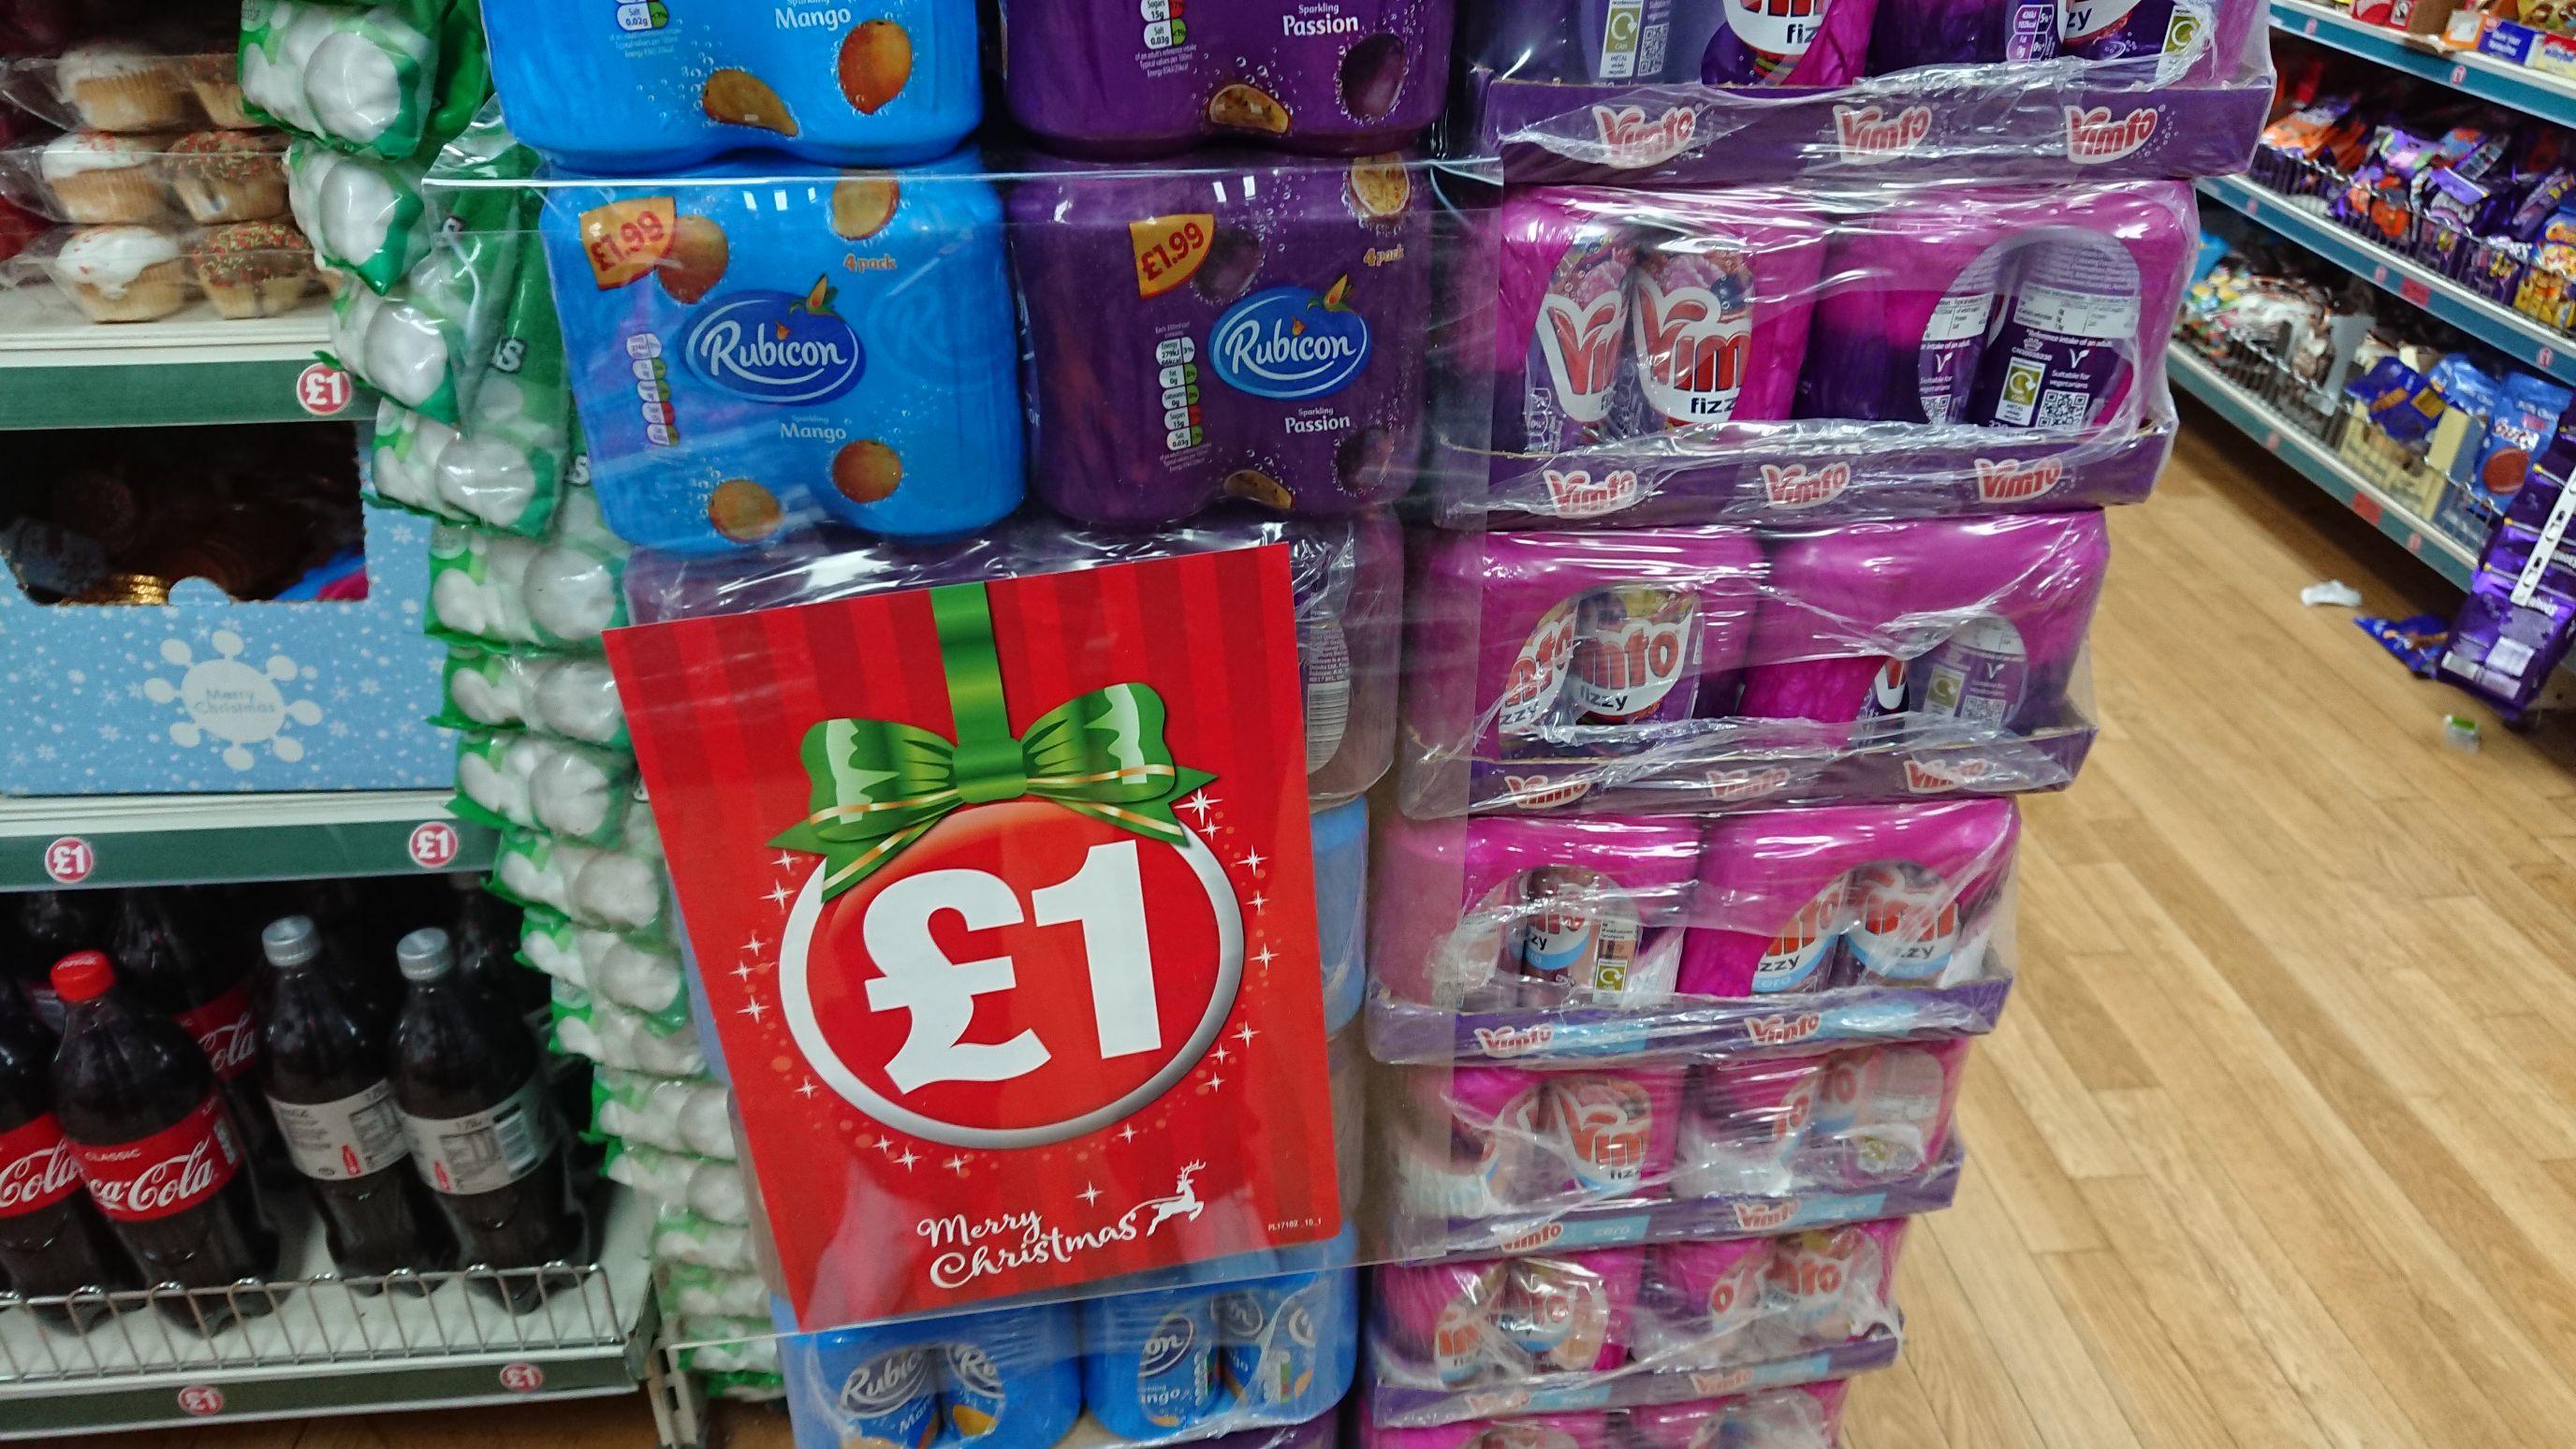 Rubicon x 4 330ML cans £1 at Poundland